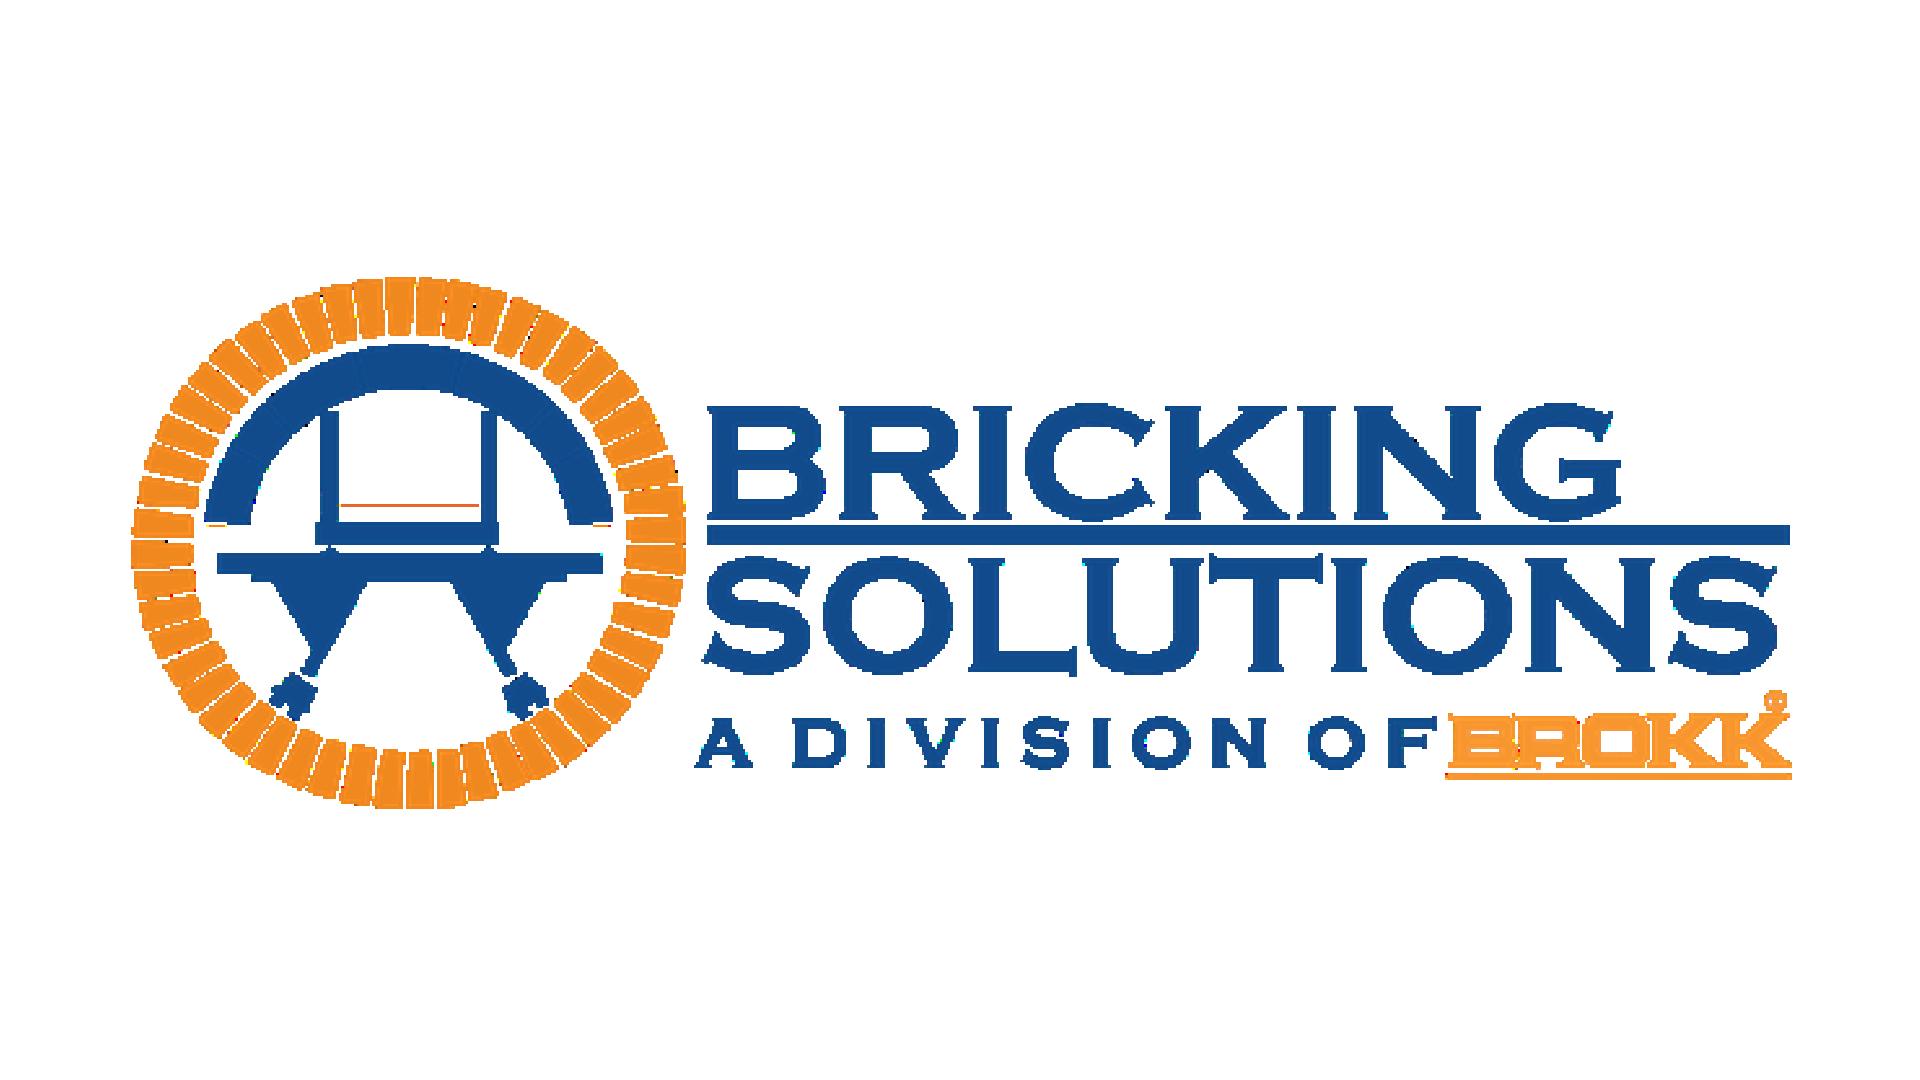 BRicking Solutions a division of Brokk